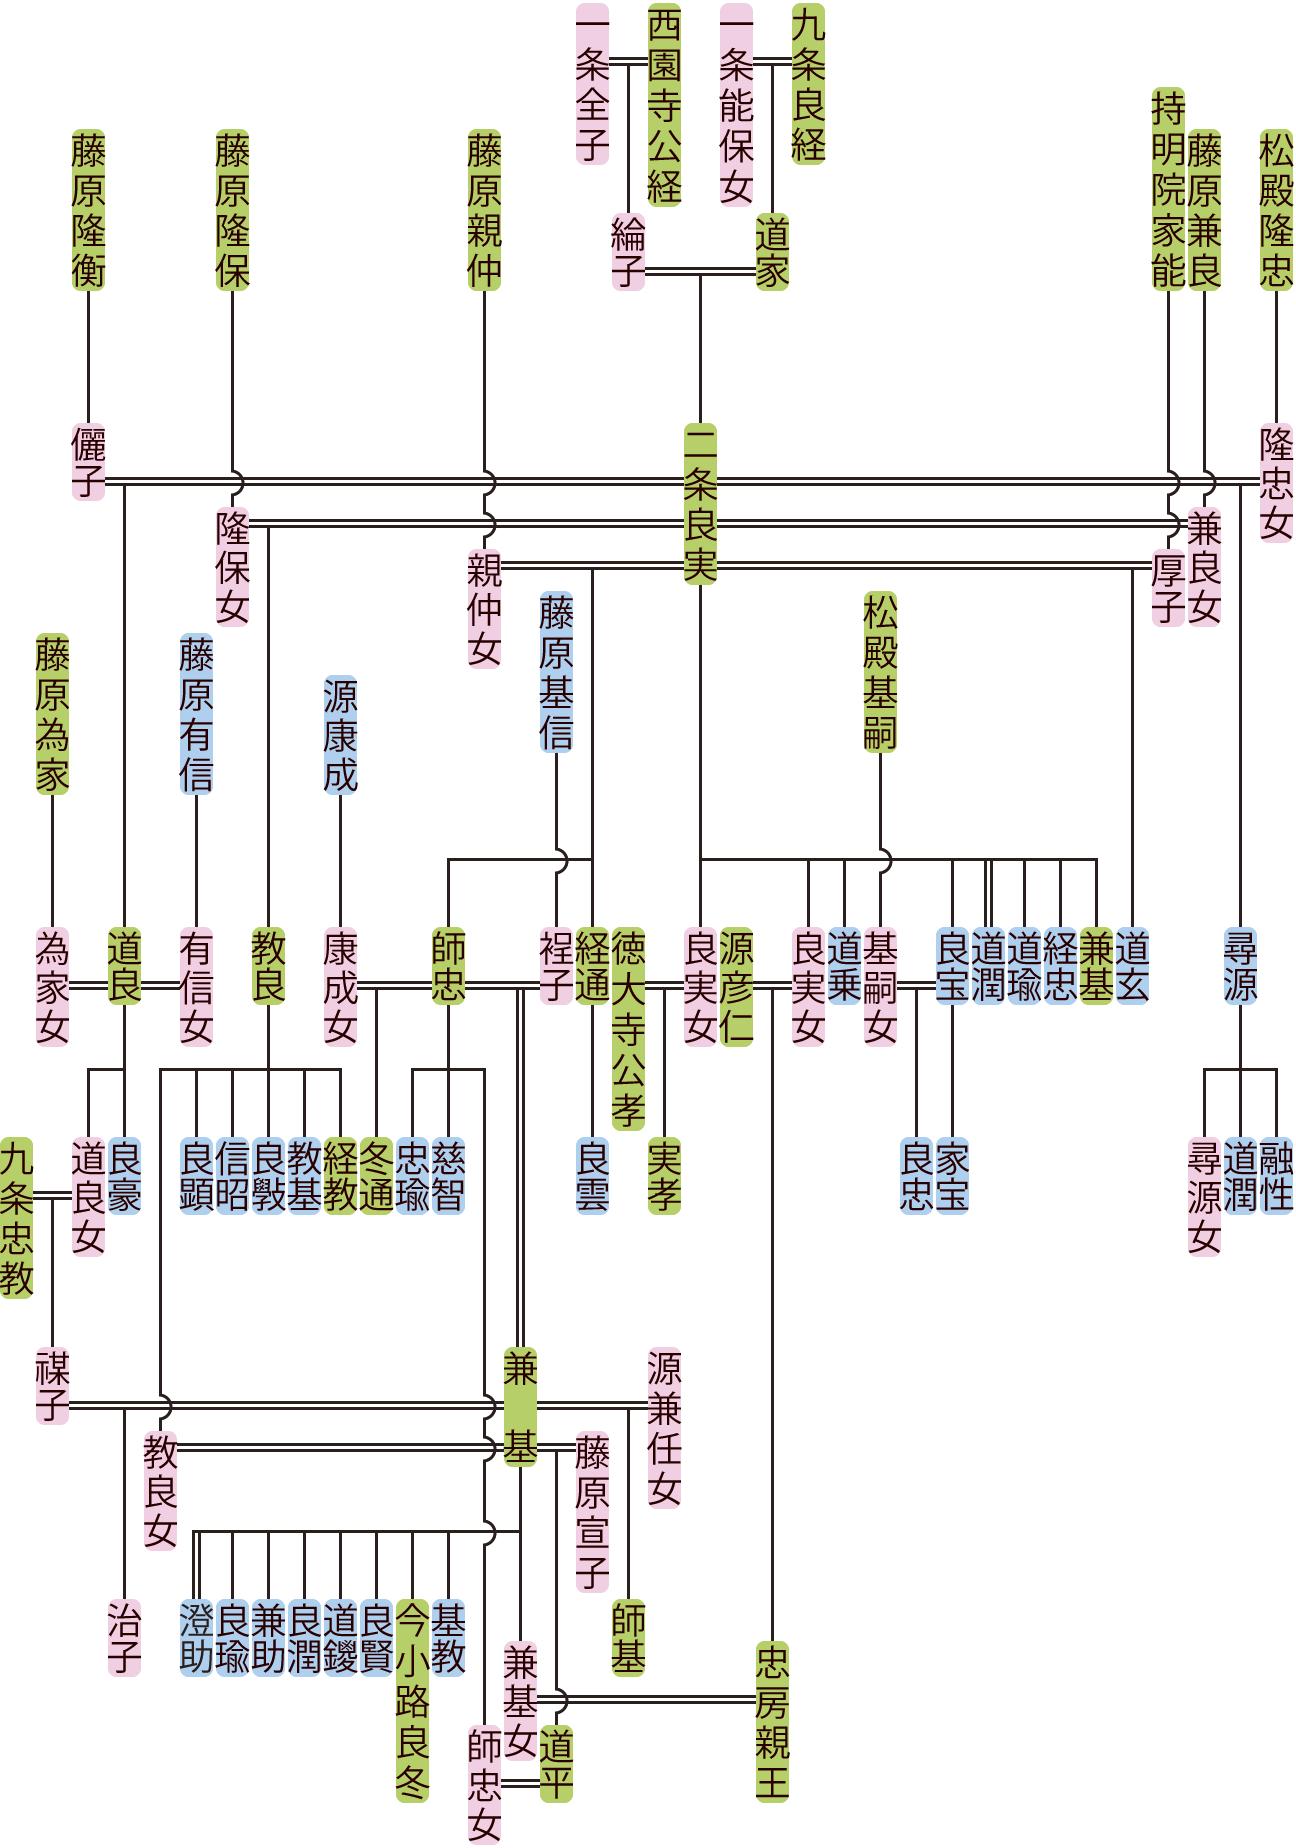 二条良実・師忠の系図